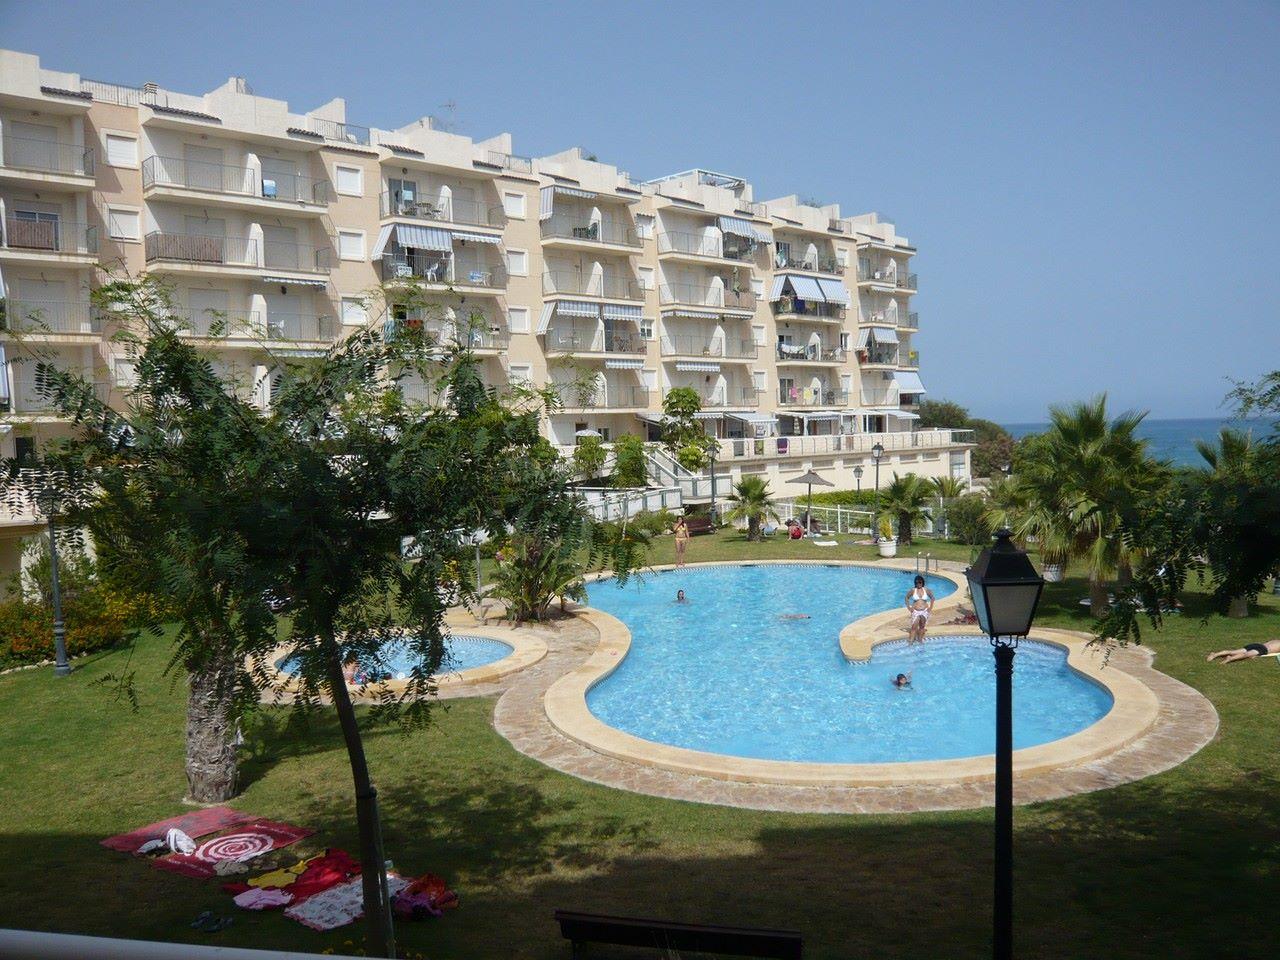 Apartment in El Campello, Cala Merced, for sale